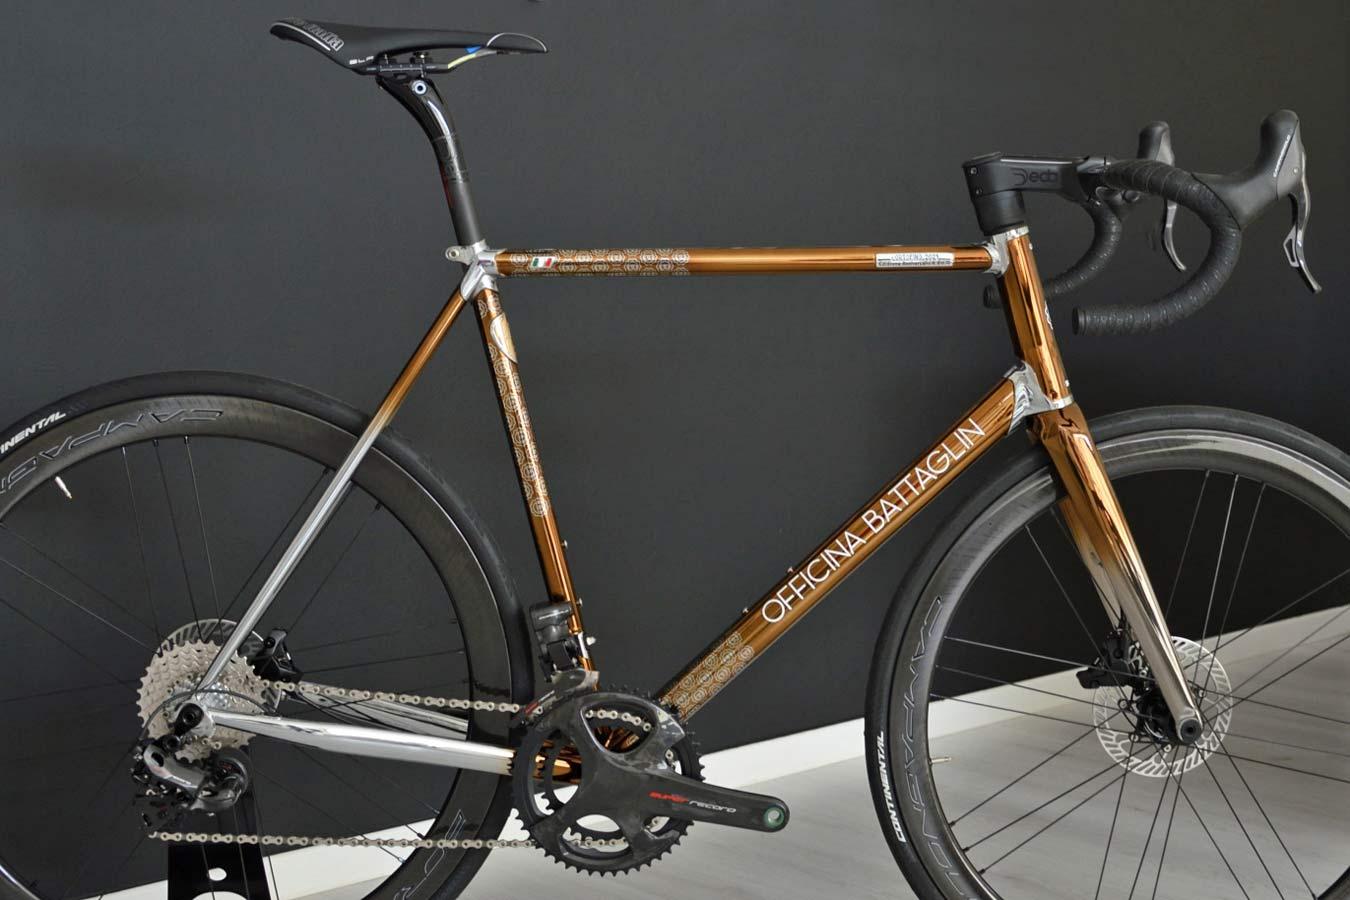 2021 Battaglin Portofino Edizione Anniversario road bike, handmade Italian modern lugged steel road bike with full internal routing,frameset